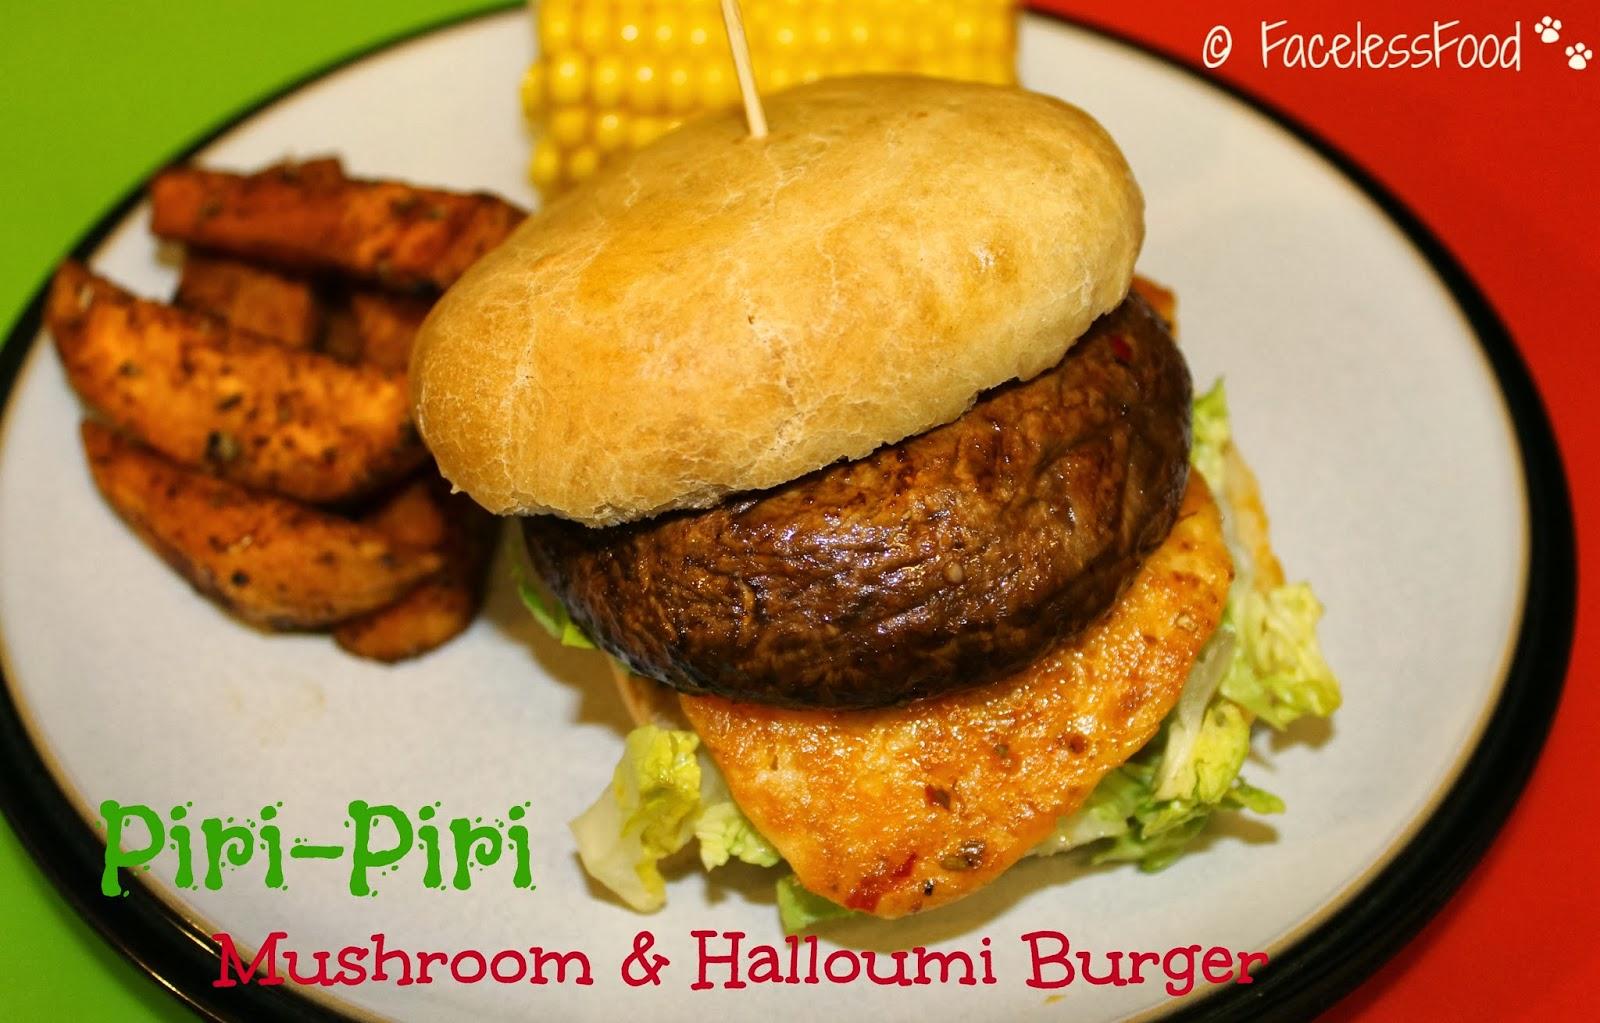 Piri-Piri Mushroom & Halloumi 'Burger'